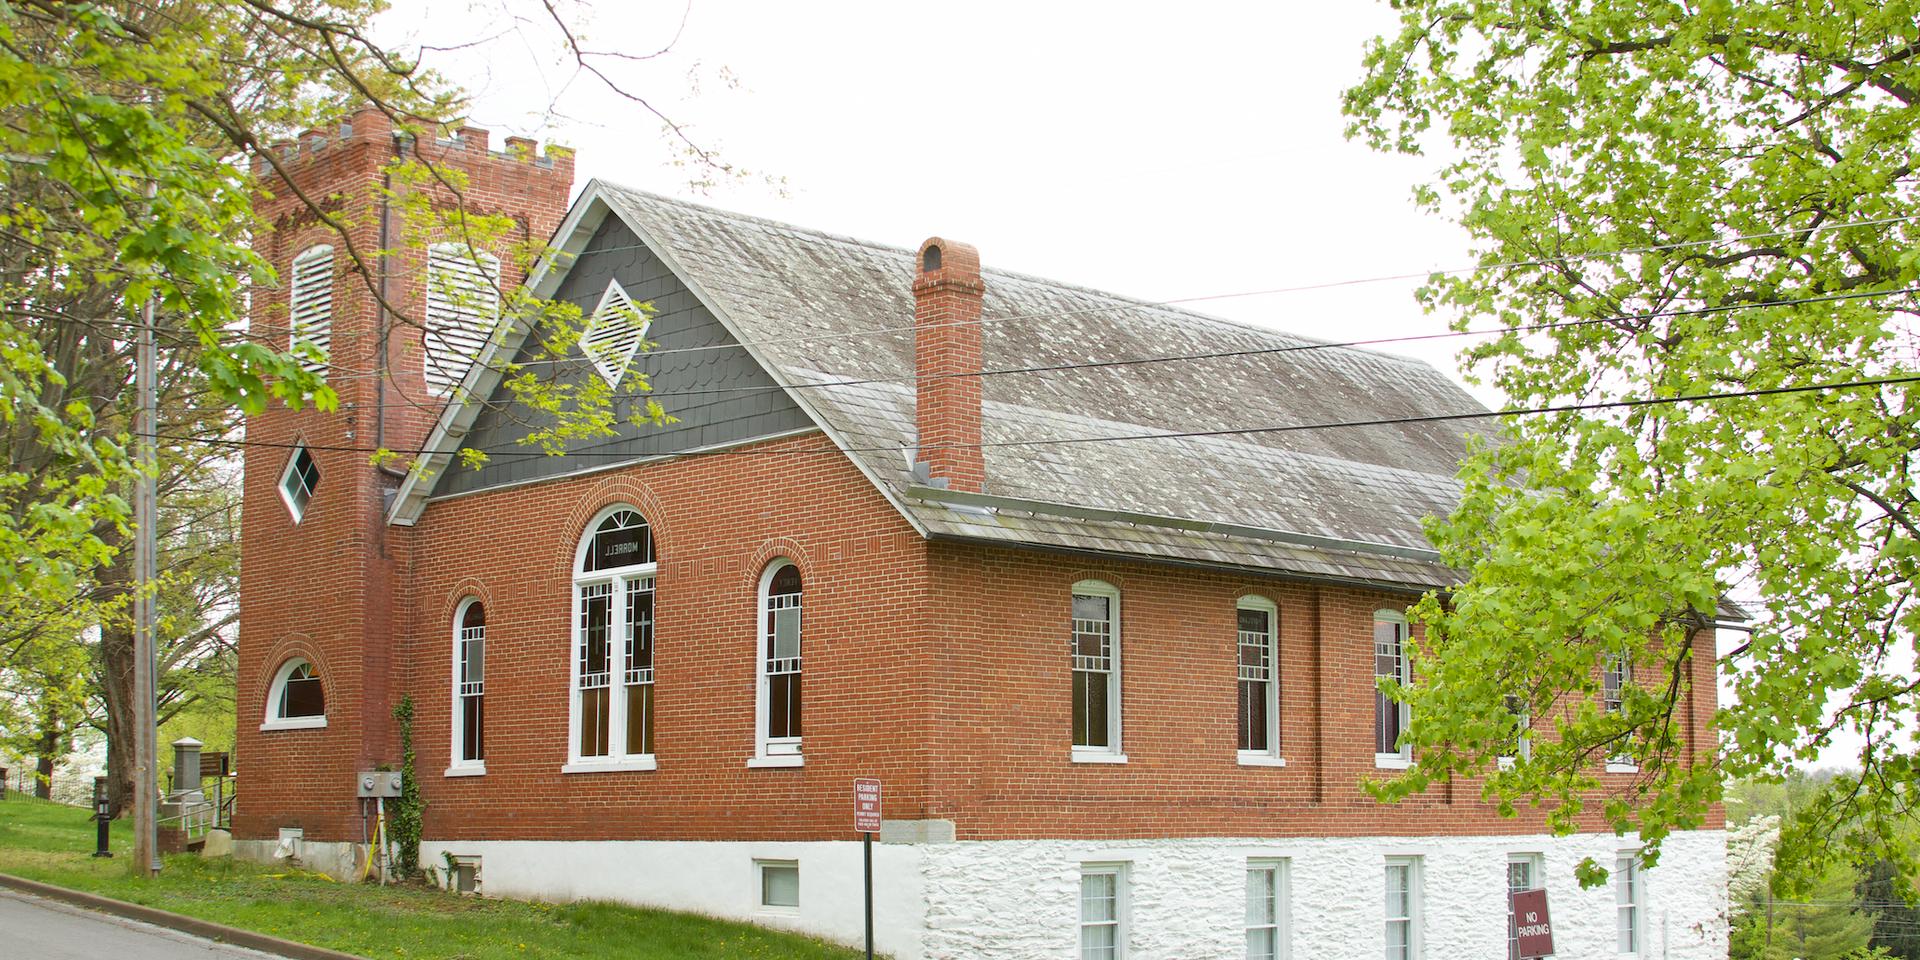 43. Curtis Freewill Baptist Church   (Photo by G. Maurice Ballard)